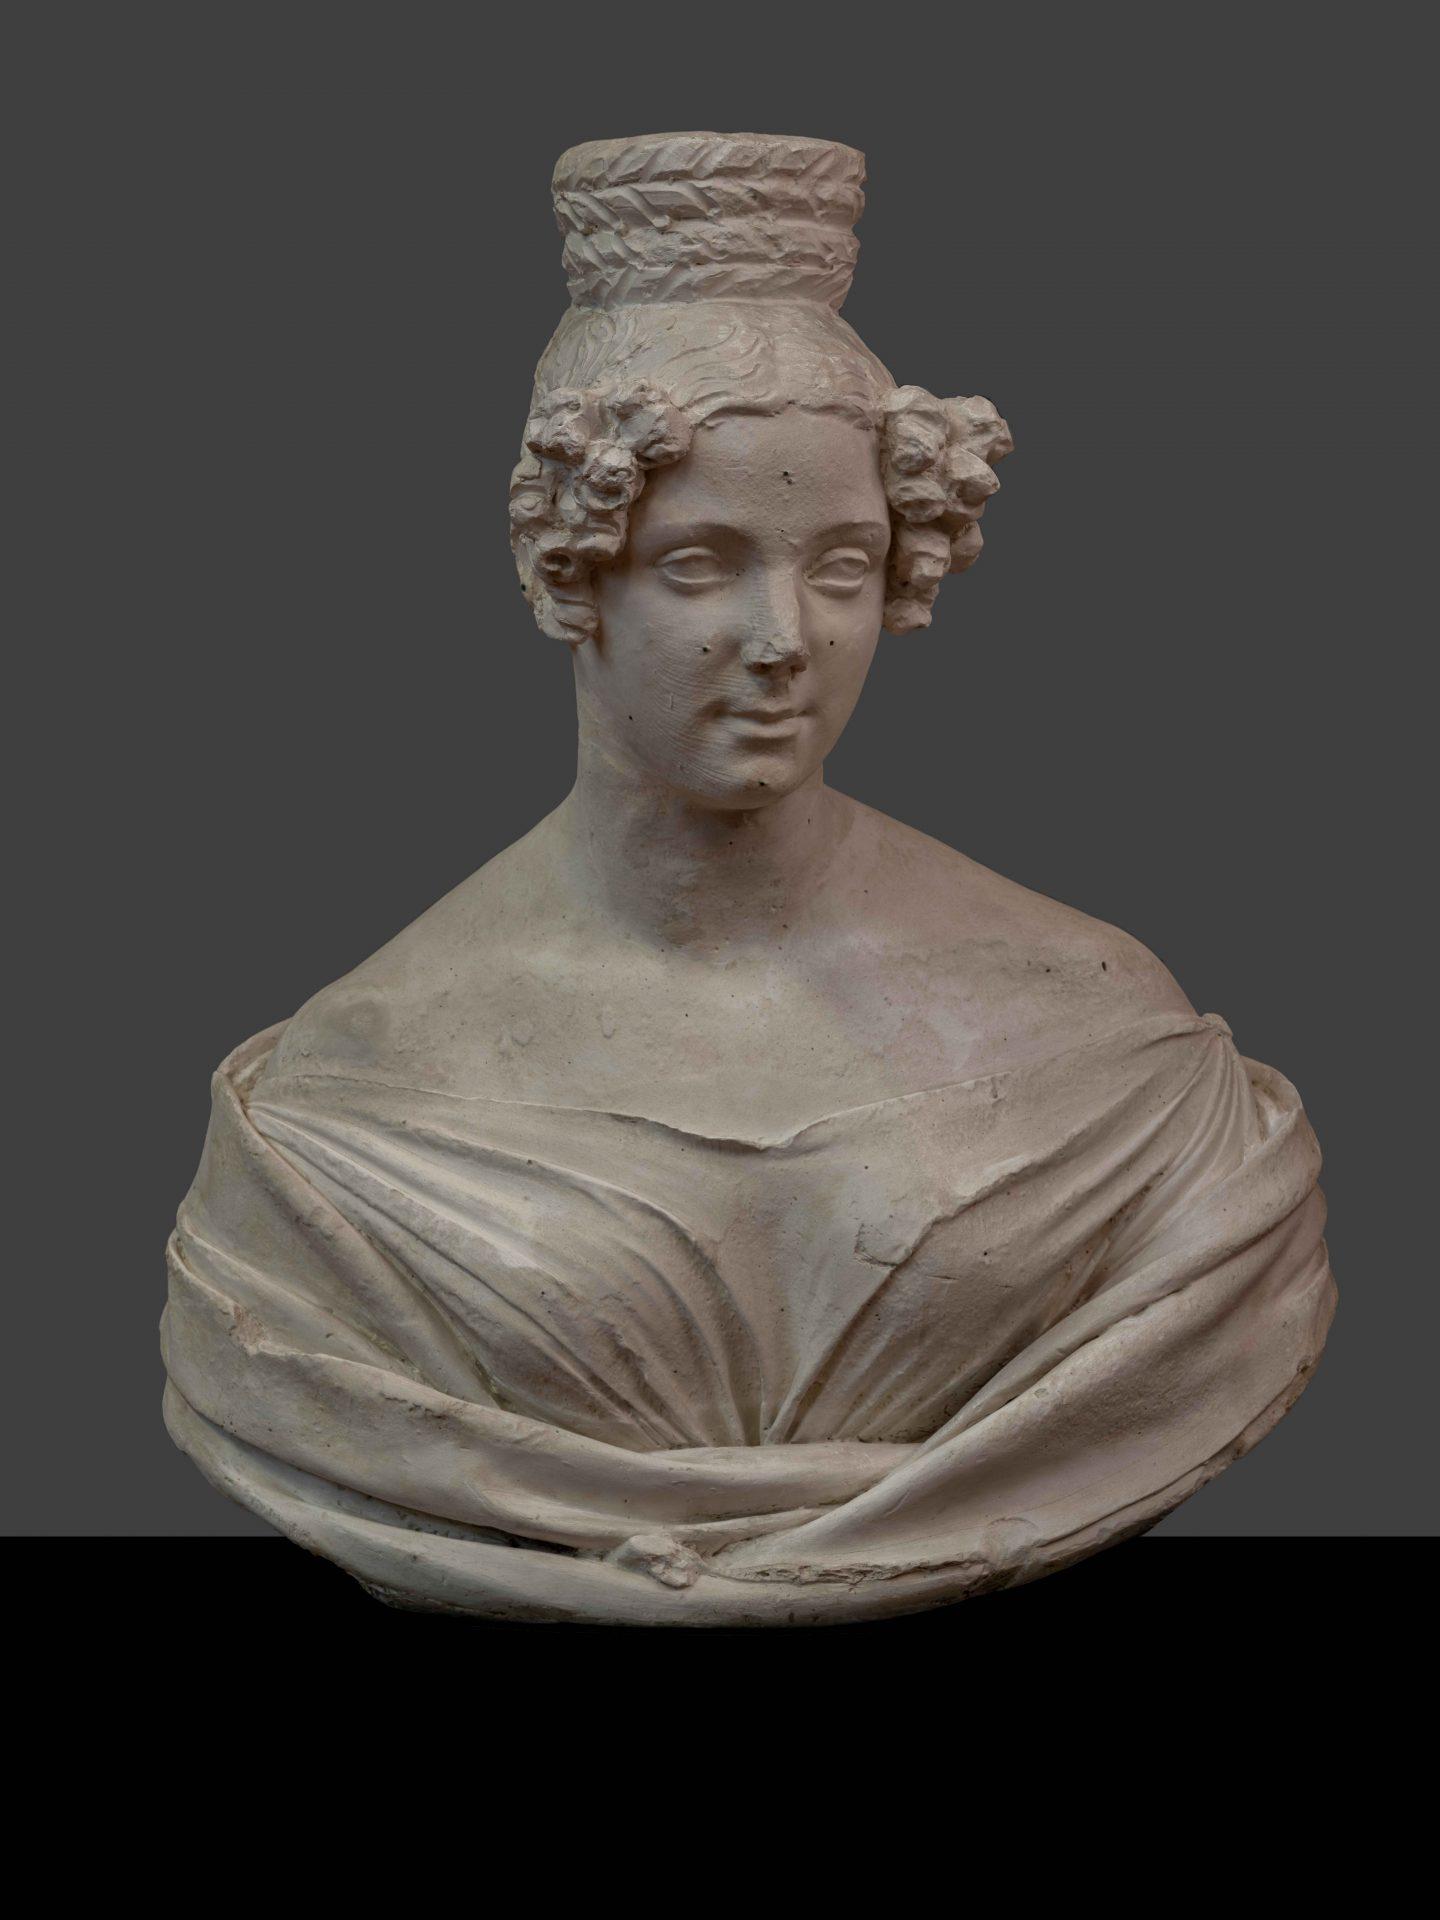 inv. scult. 1551 busto femminile. ph. a. quattrone aqtt0875